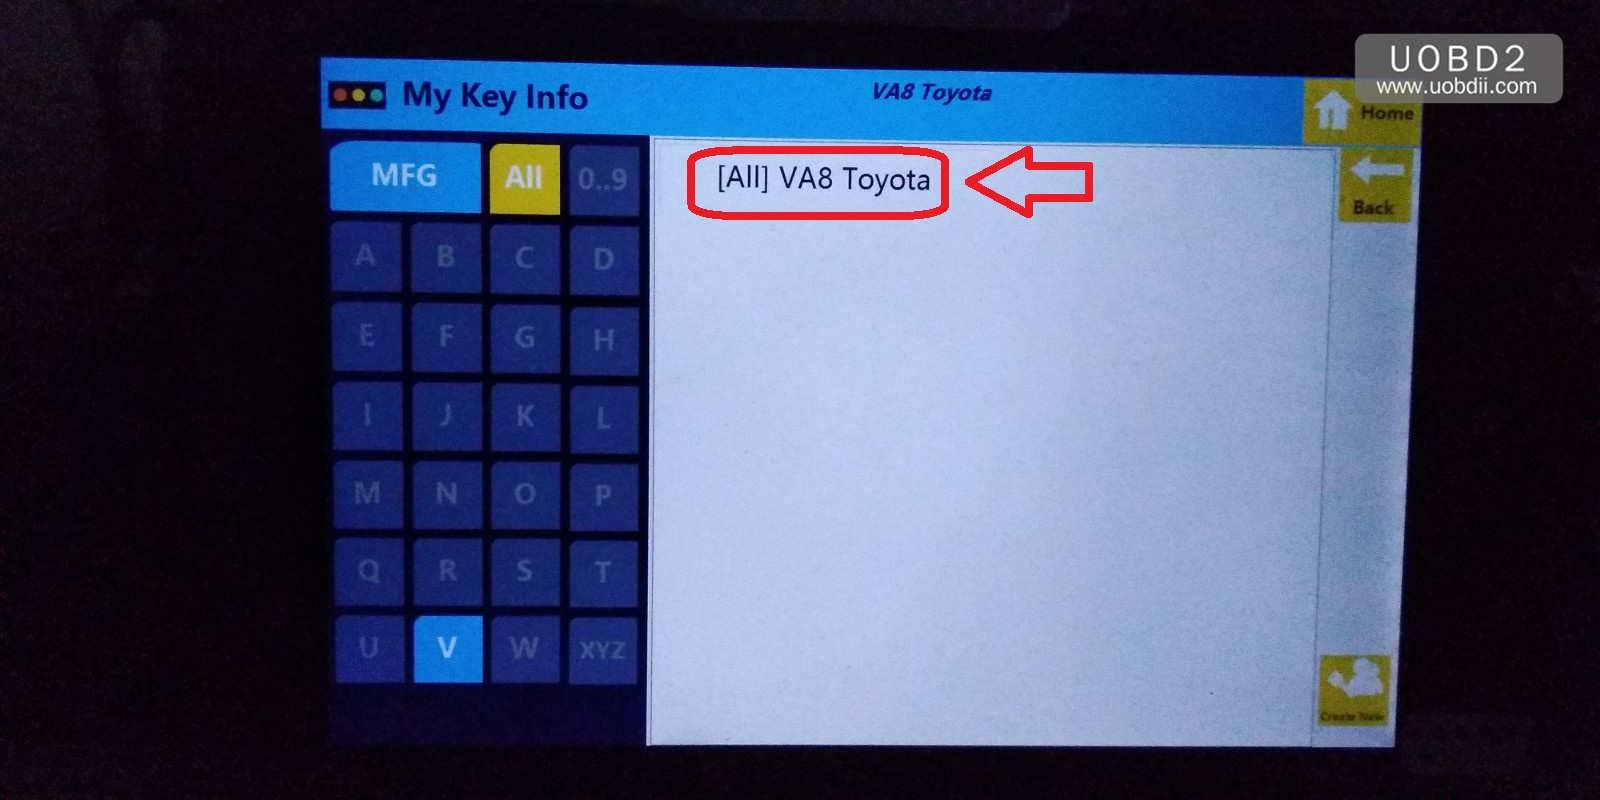 sec-e9z-create-new-key-for-va8-toyota-22